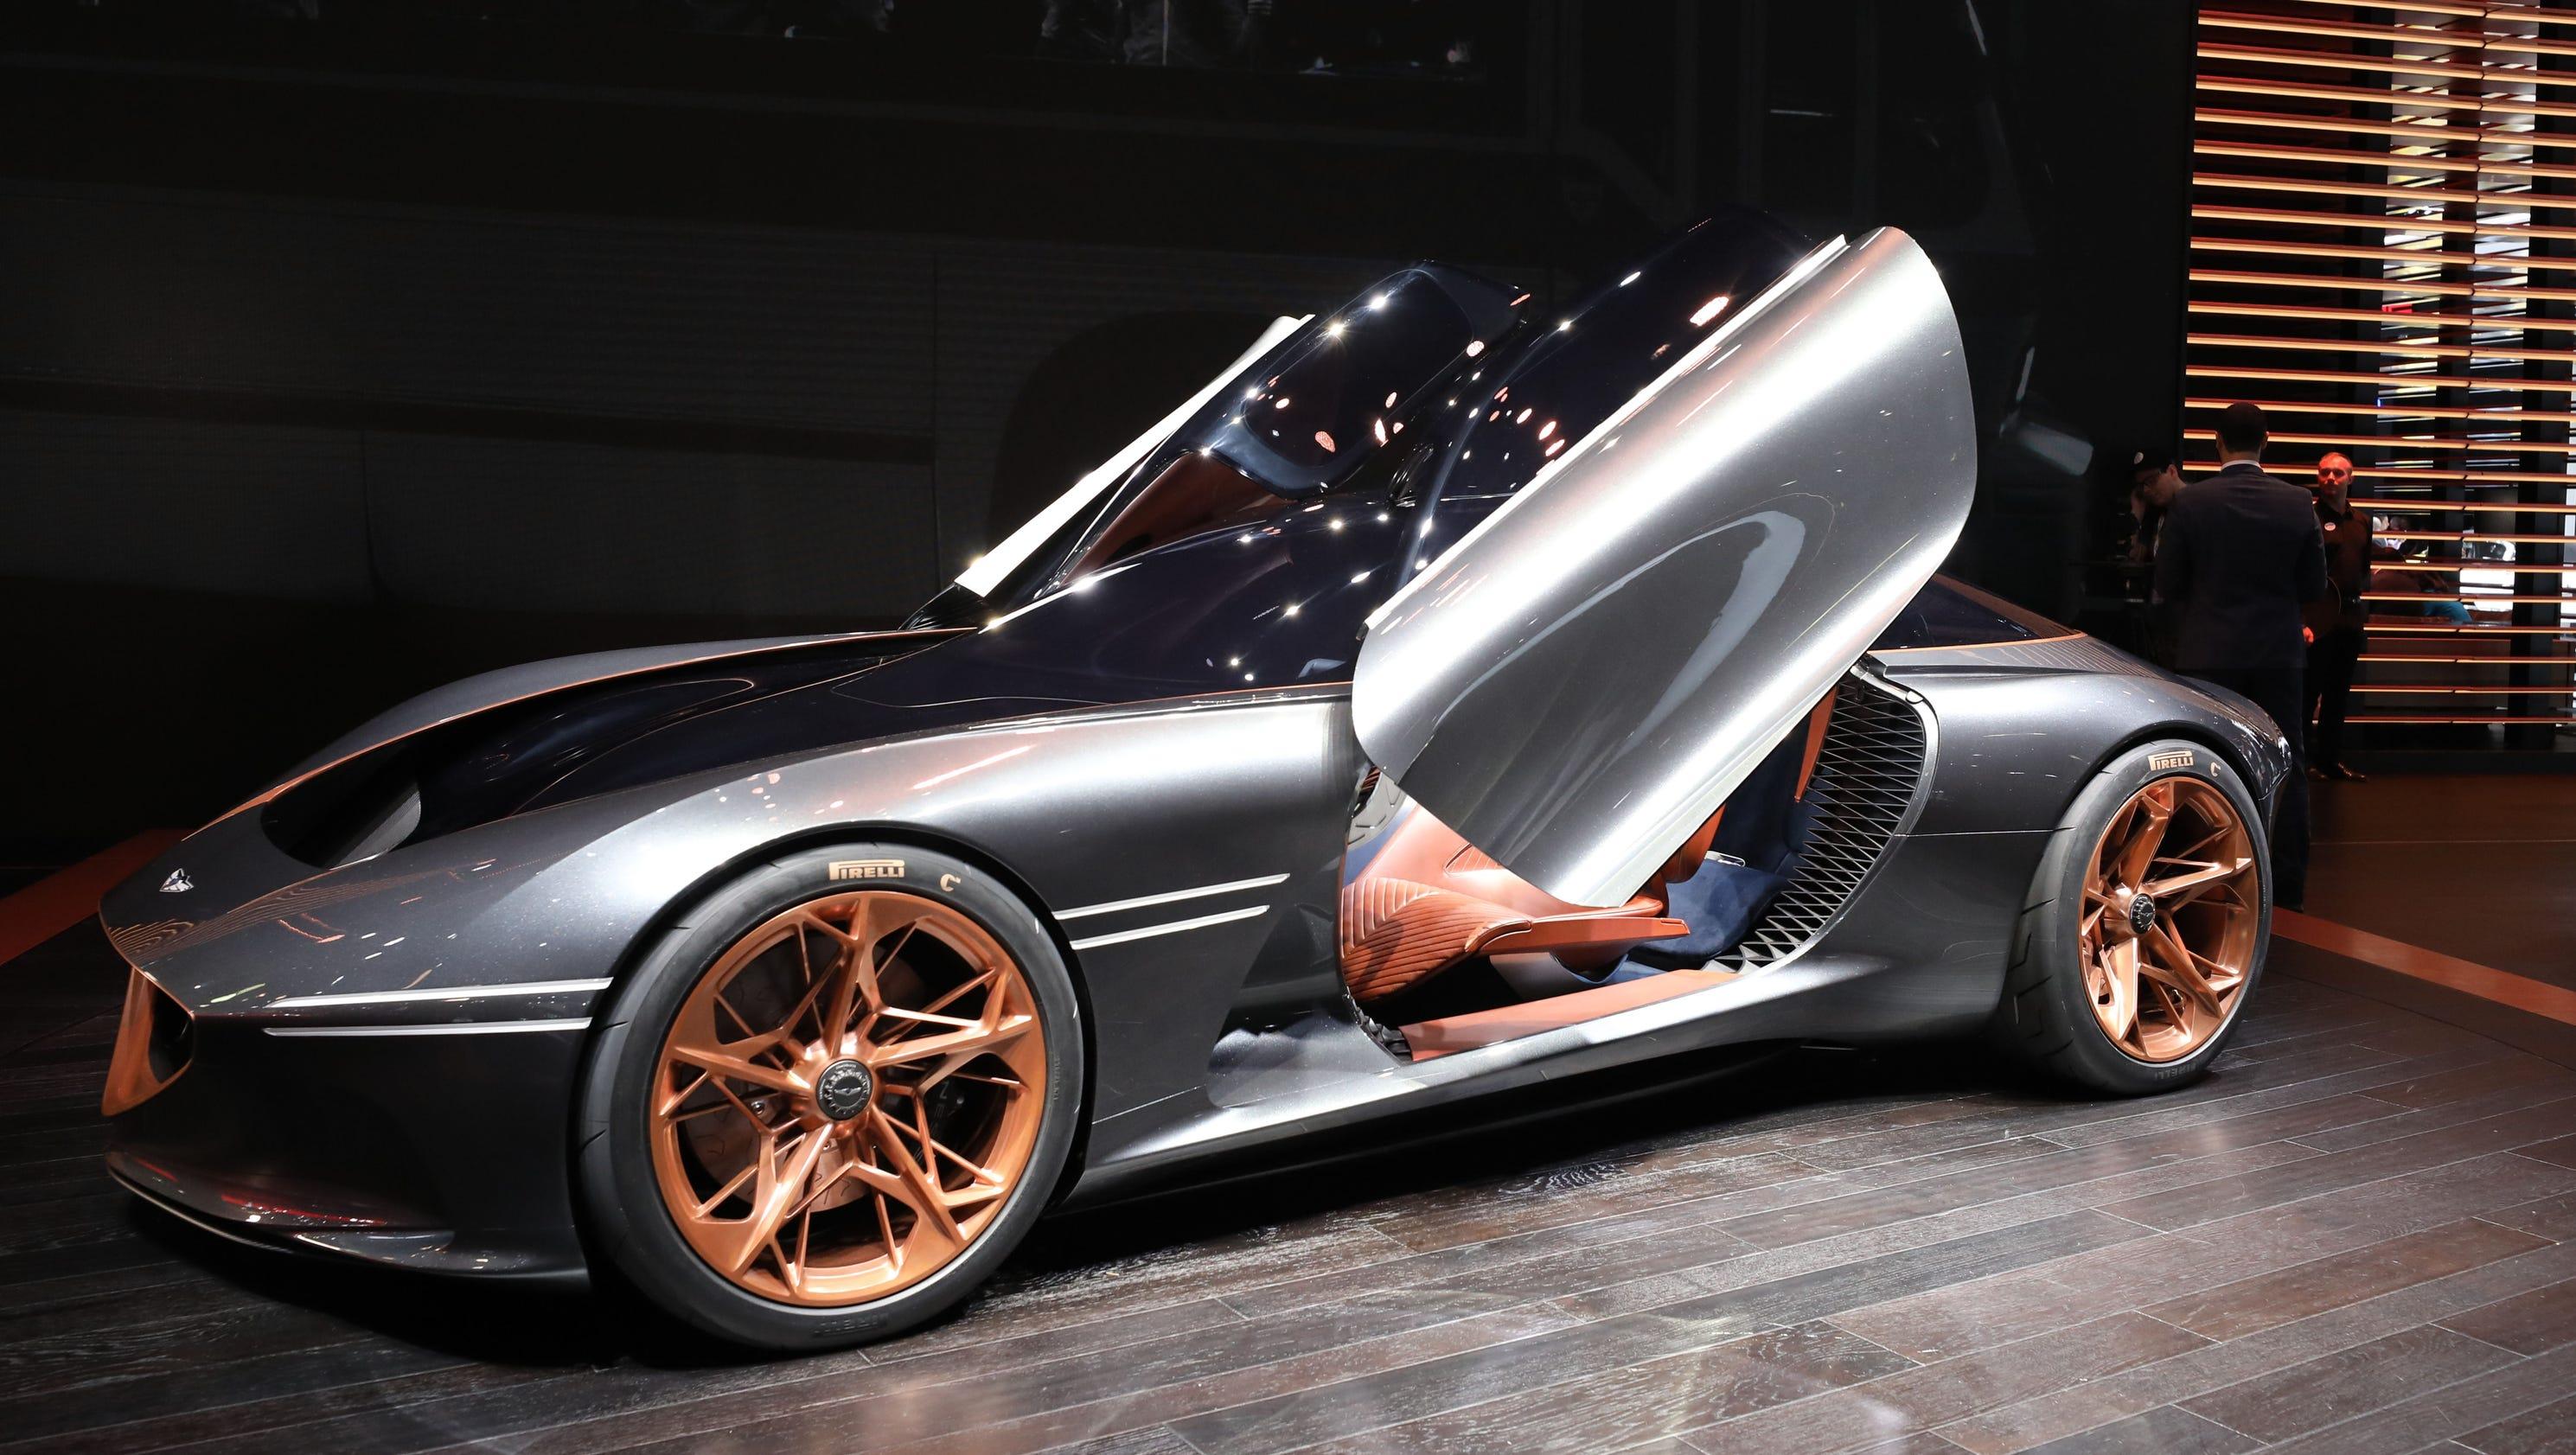 Stunning New Cars, SUVs Light Up The New York Auto Show